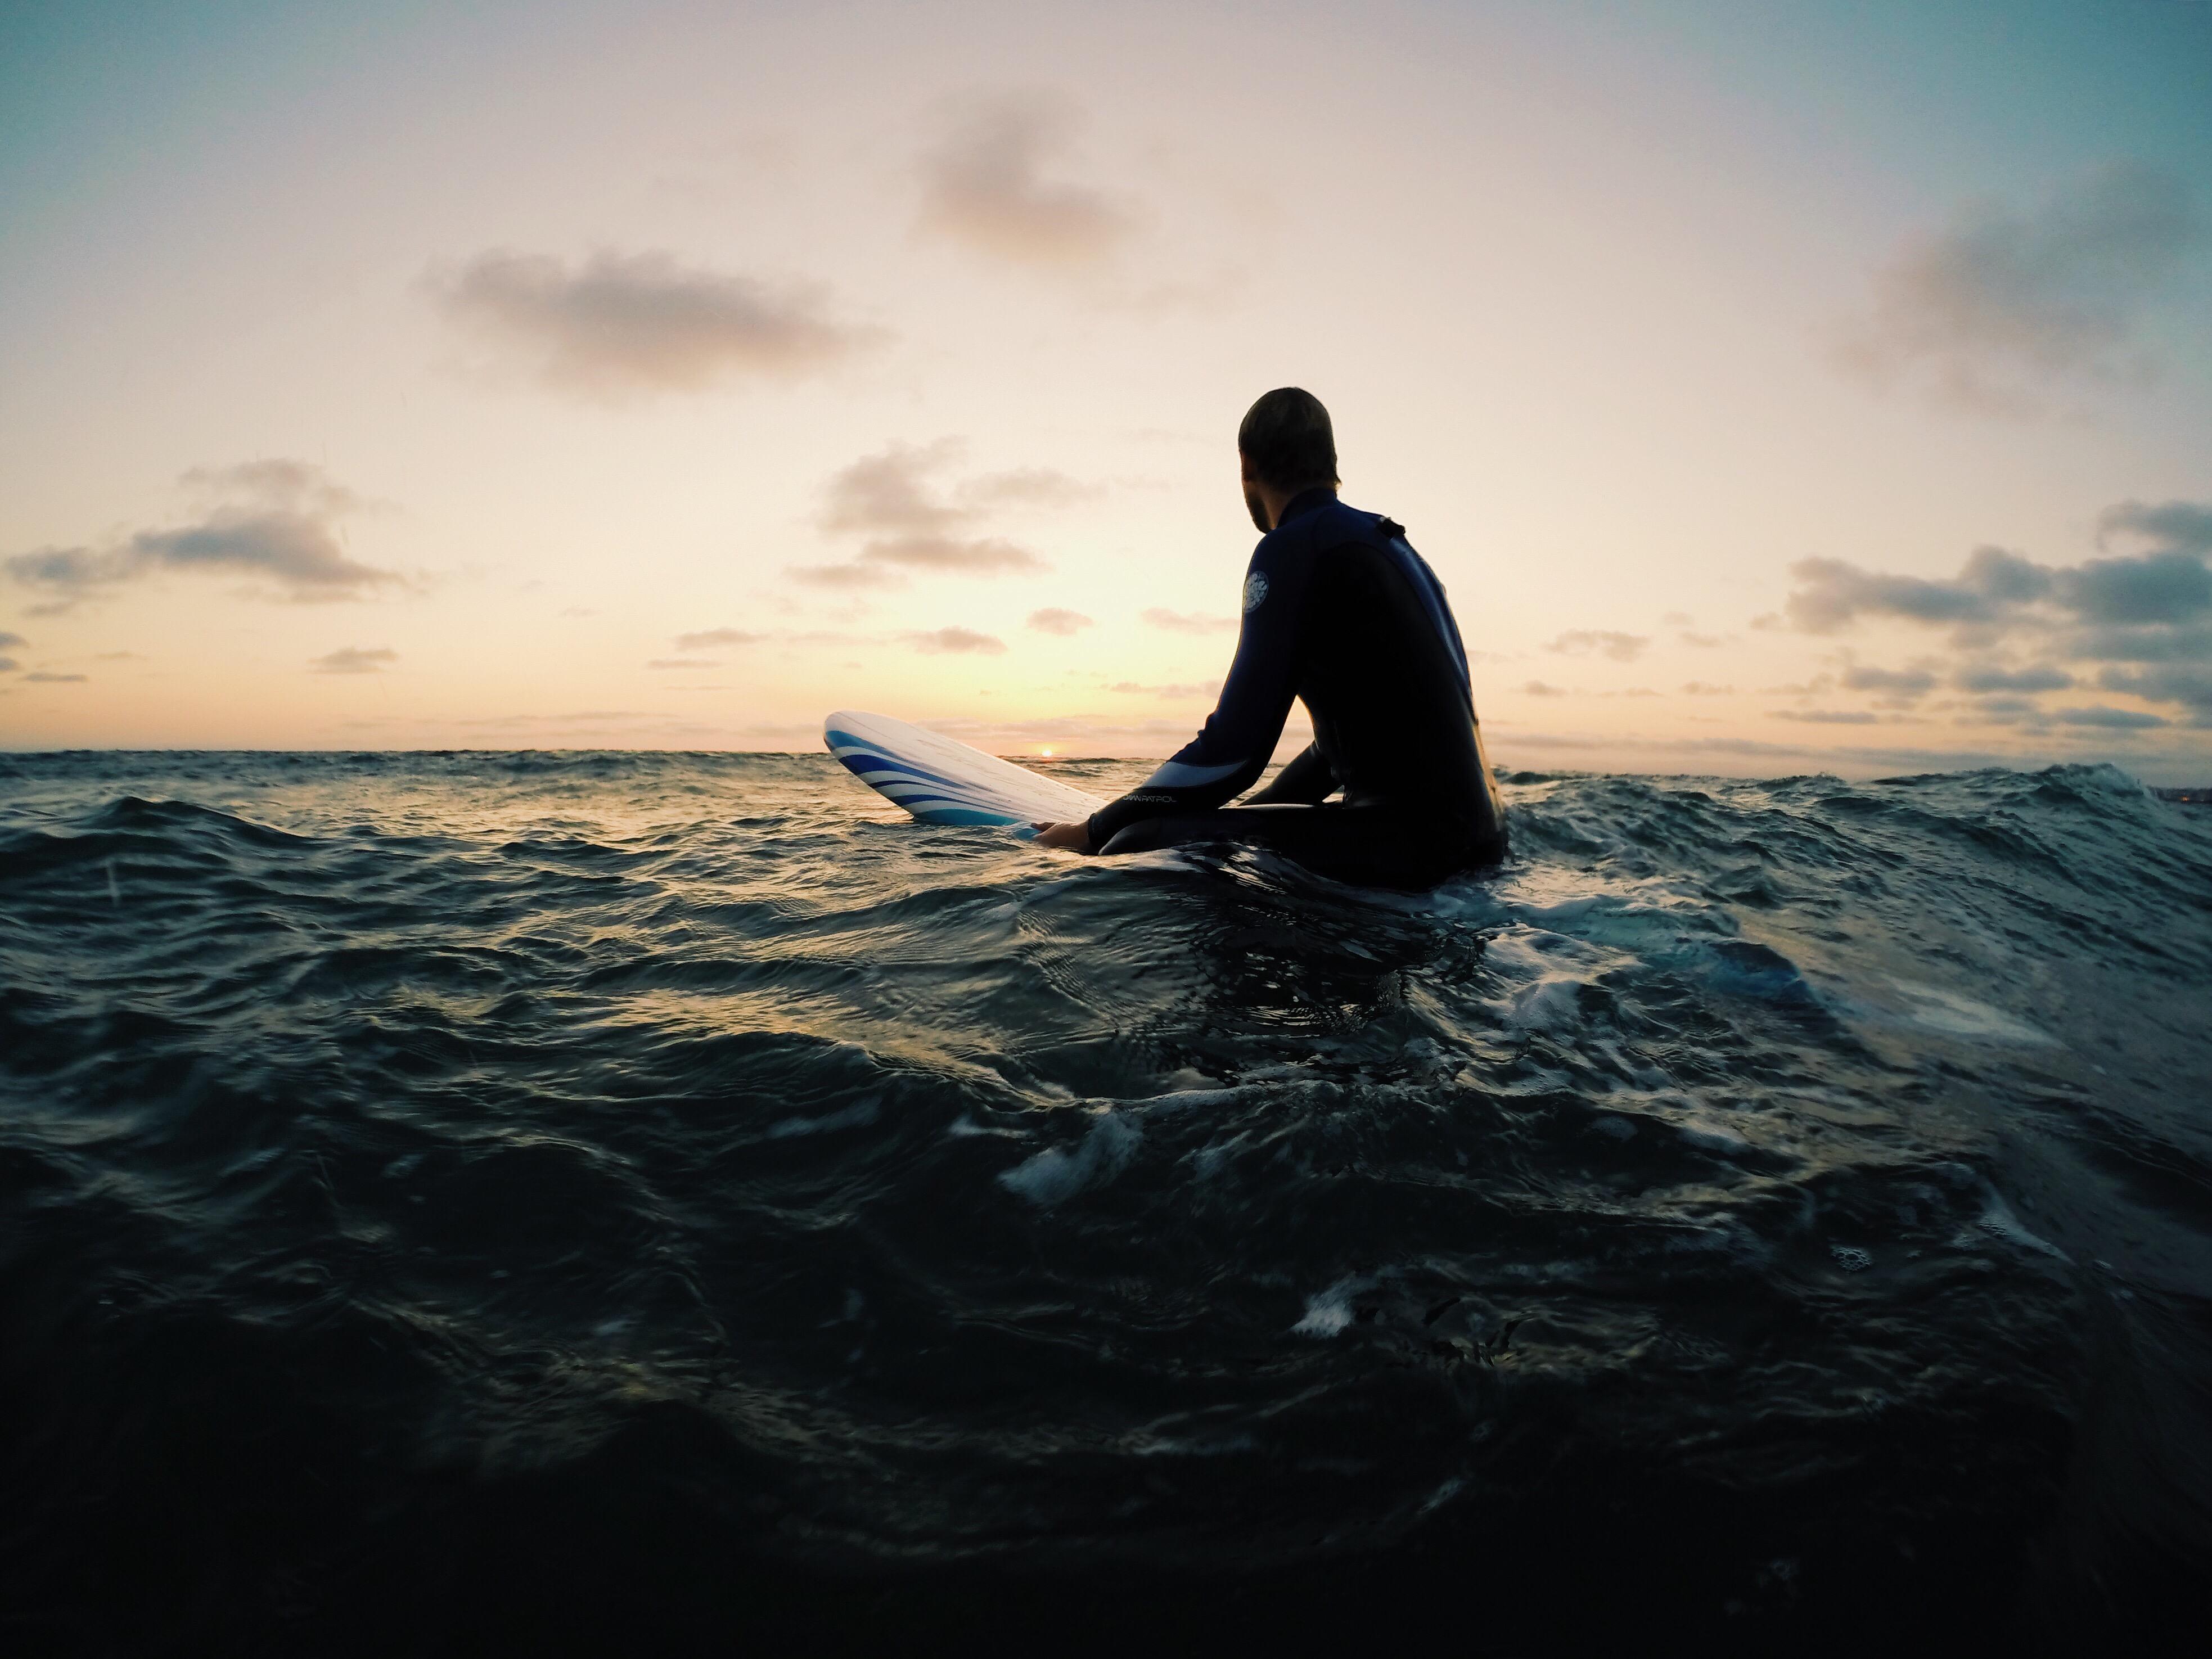 redondo-beach-california_t20_LAN9NZ